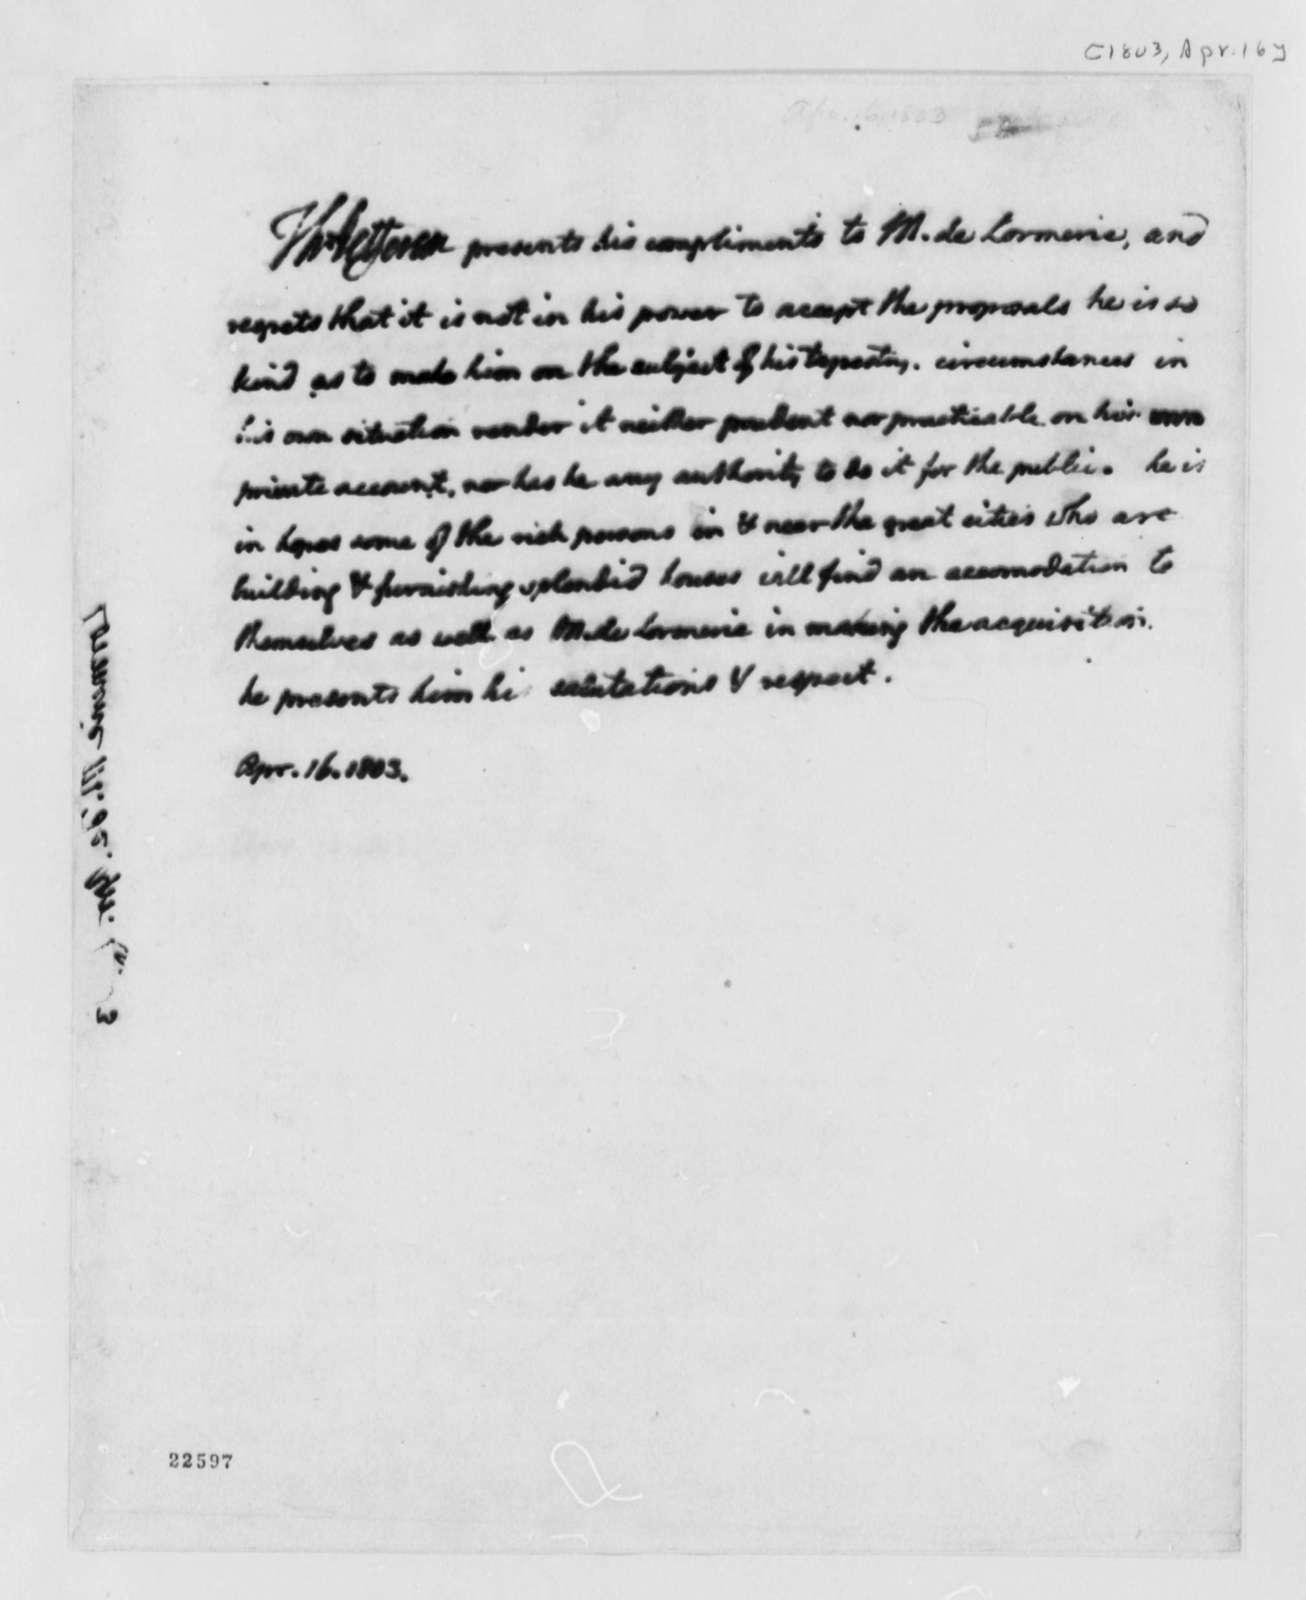 Thomas Jefferson to De Lormerie, April 16, 1803